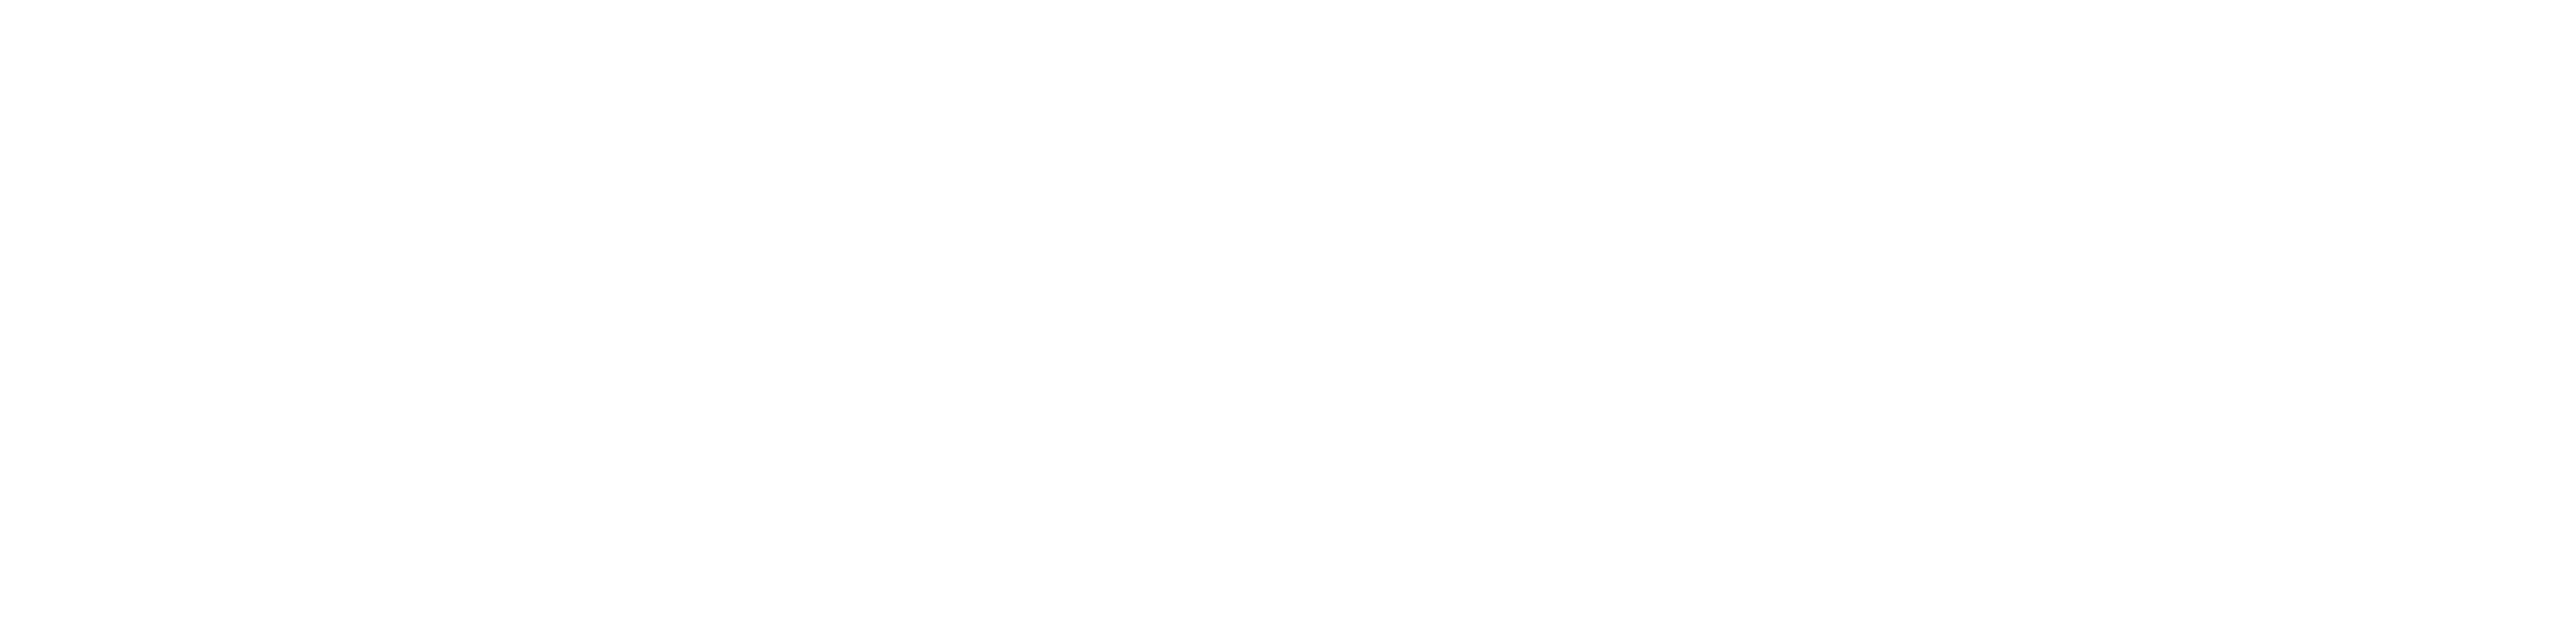 LudoCraft logo